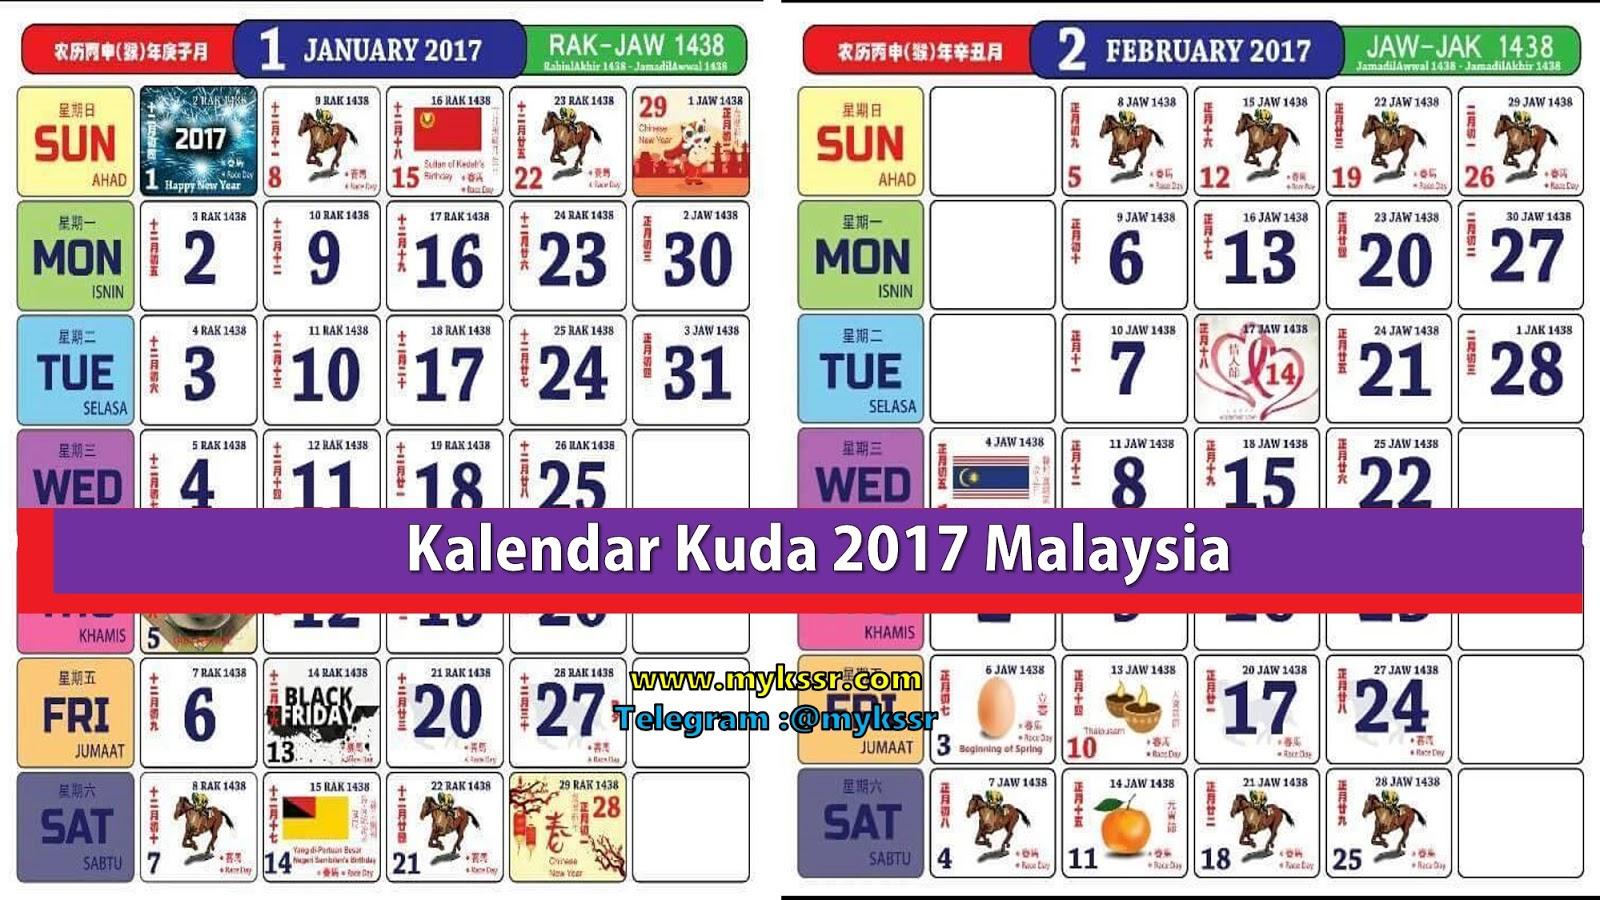 Kalendar Kuda 2017 Related Keywords & Suggestions - Kalendar Kuda 2017 ...